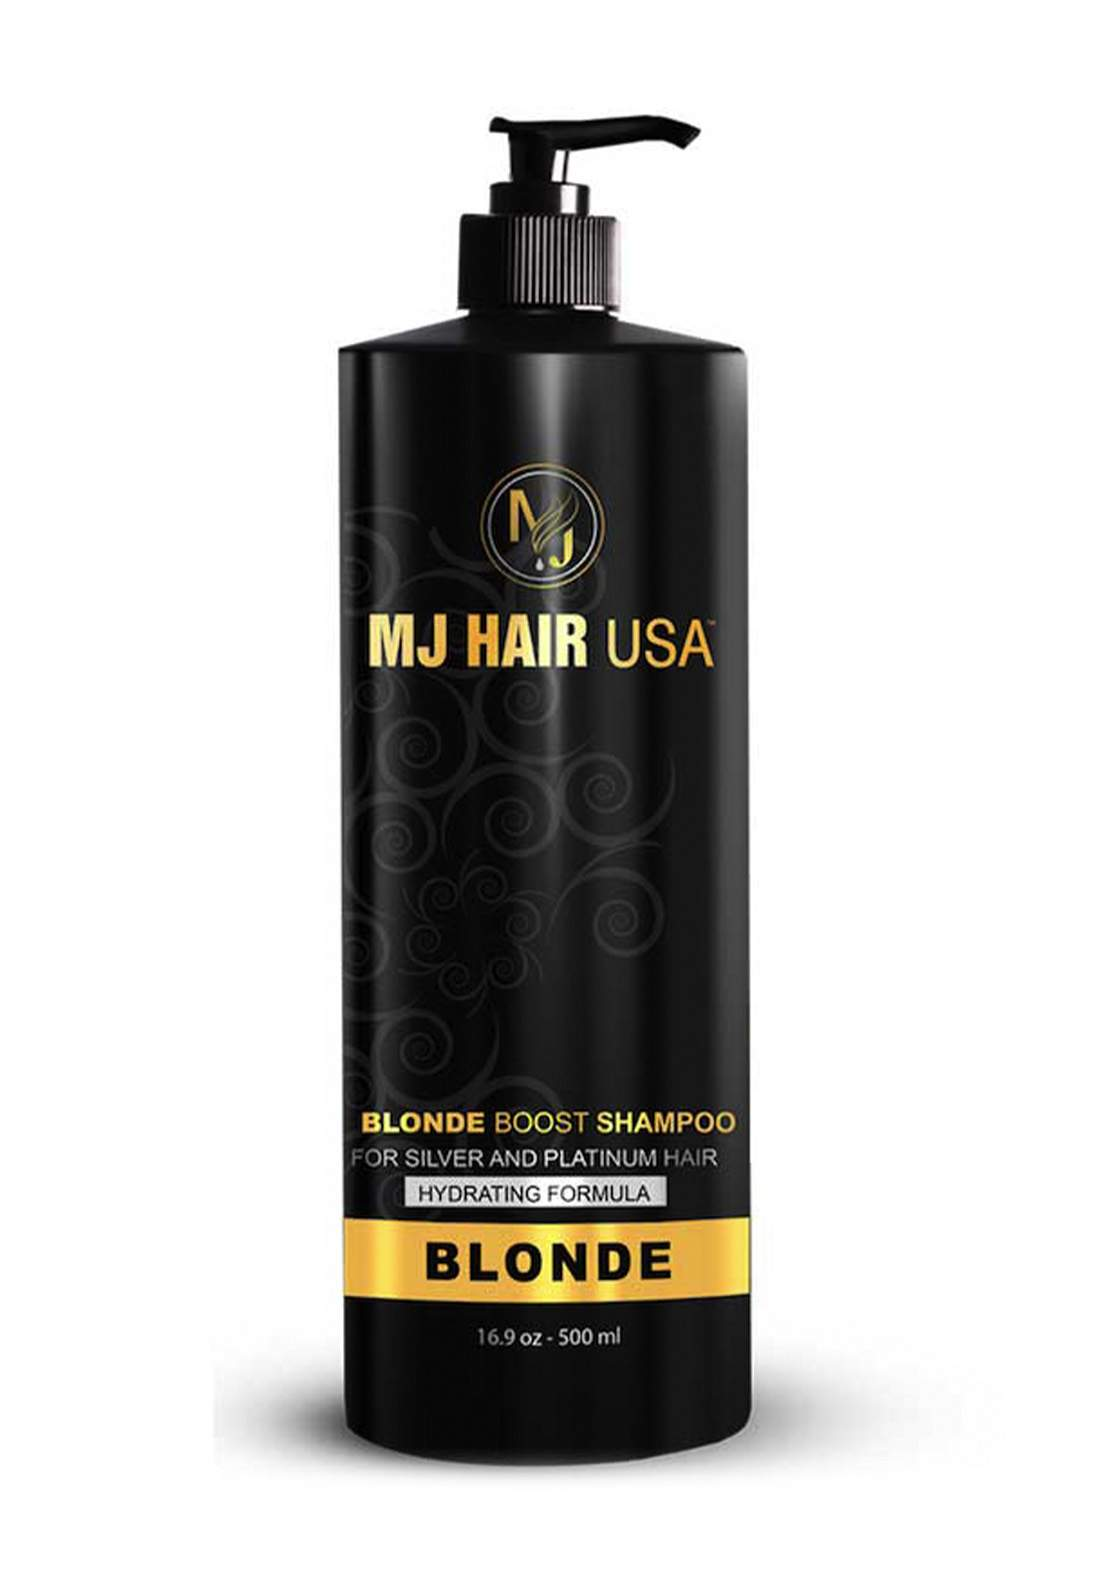 Mj Hair Usa Blonde Boost Shampoo 500ml  شامبو للشعر